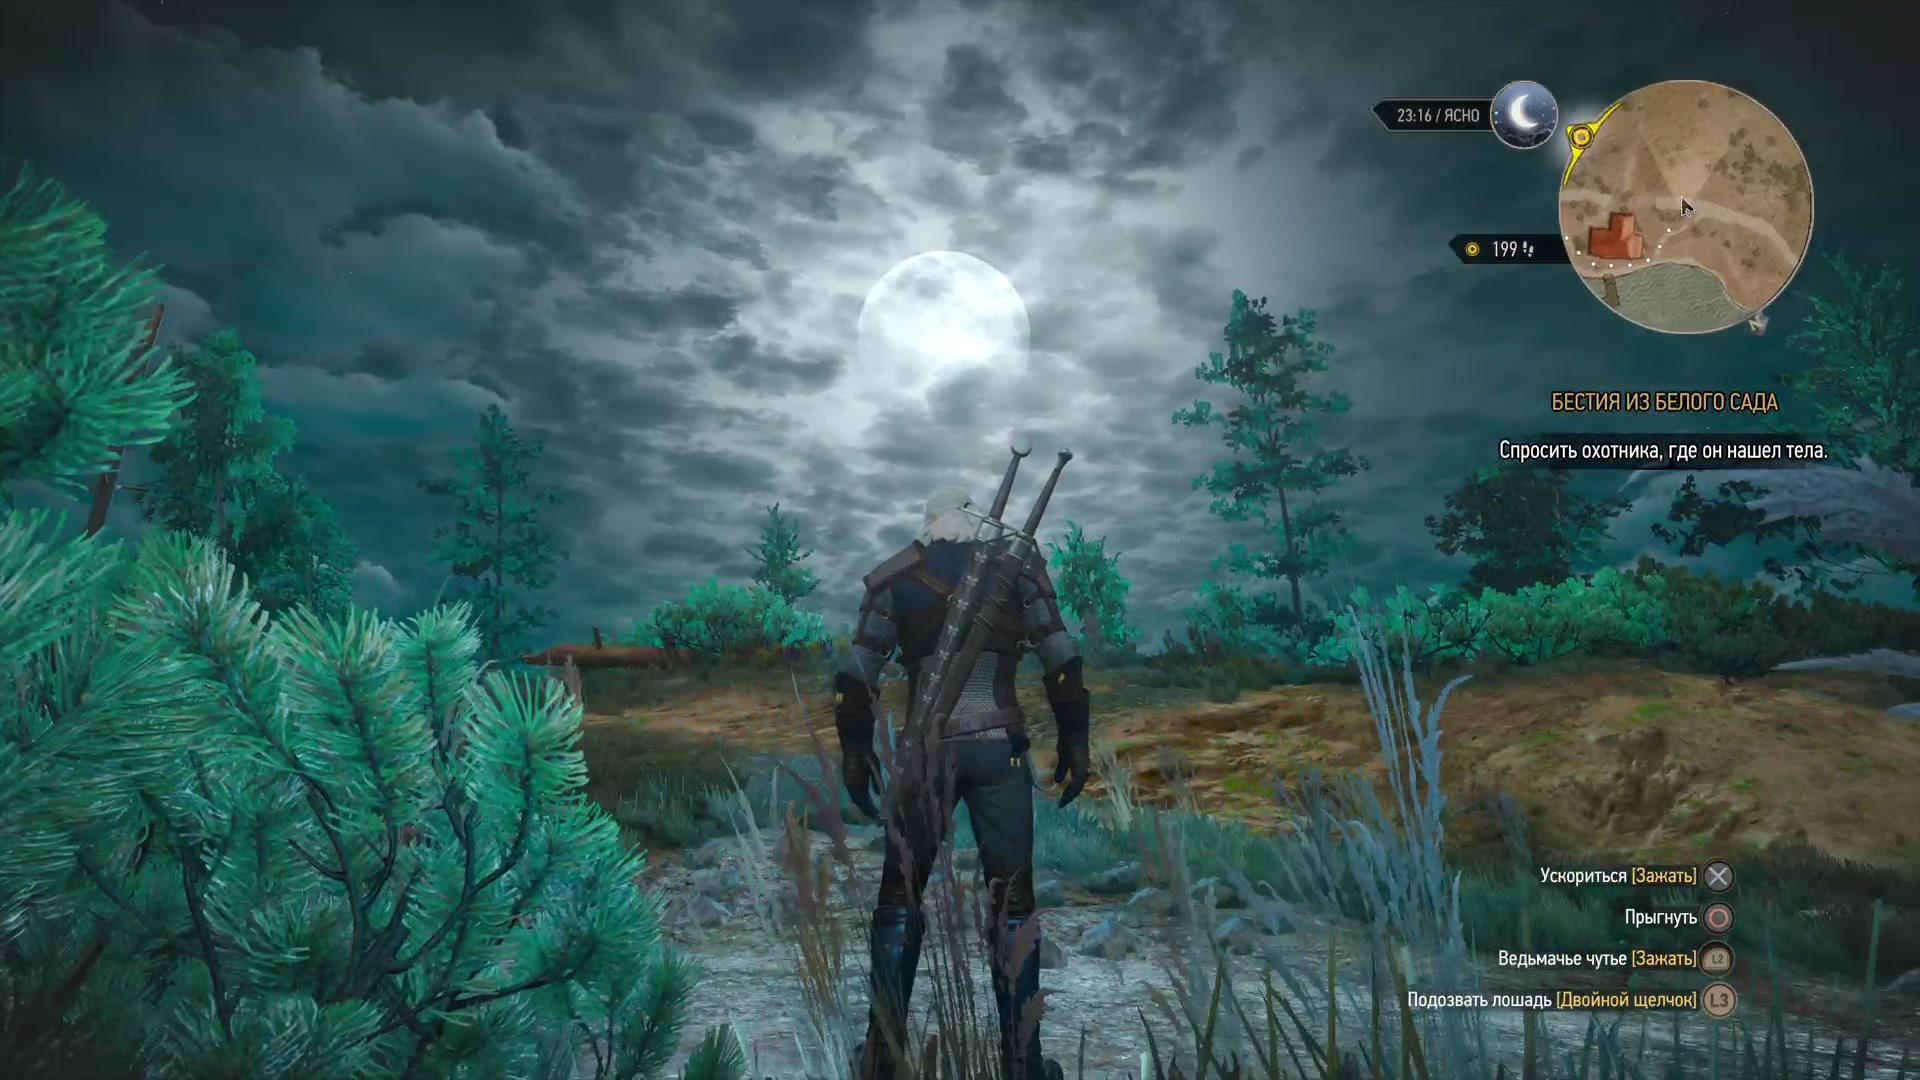 Ведьмак 3_ Дикая Охота_20180310140531 631.jpg - Witcher 3: Wild Hunt, the